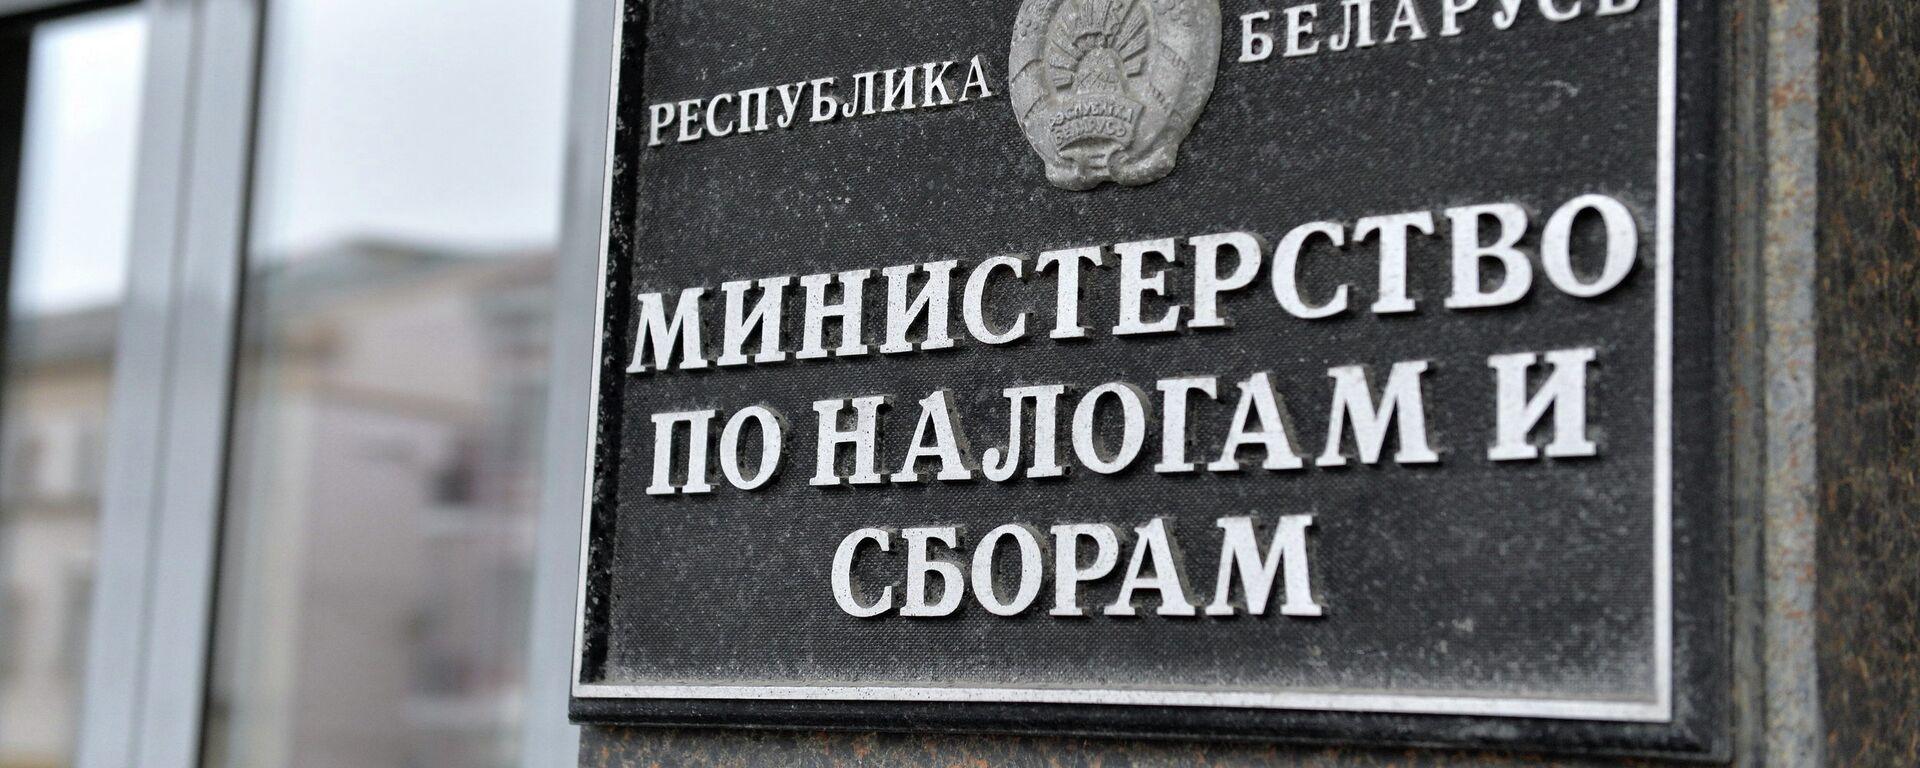 Министерство по налогам и сборам - Sputnik Беларусь, 1920, 15.01.2021